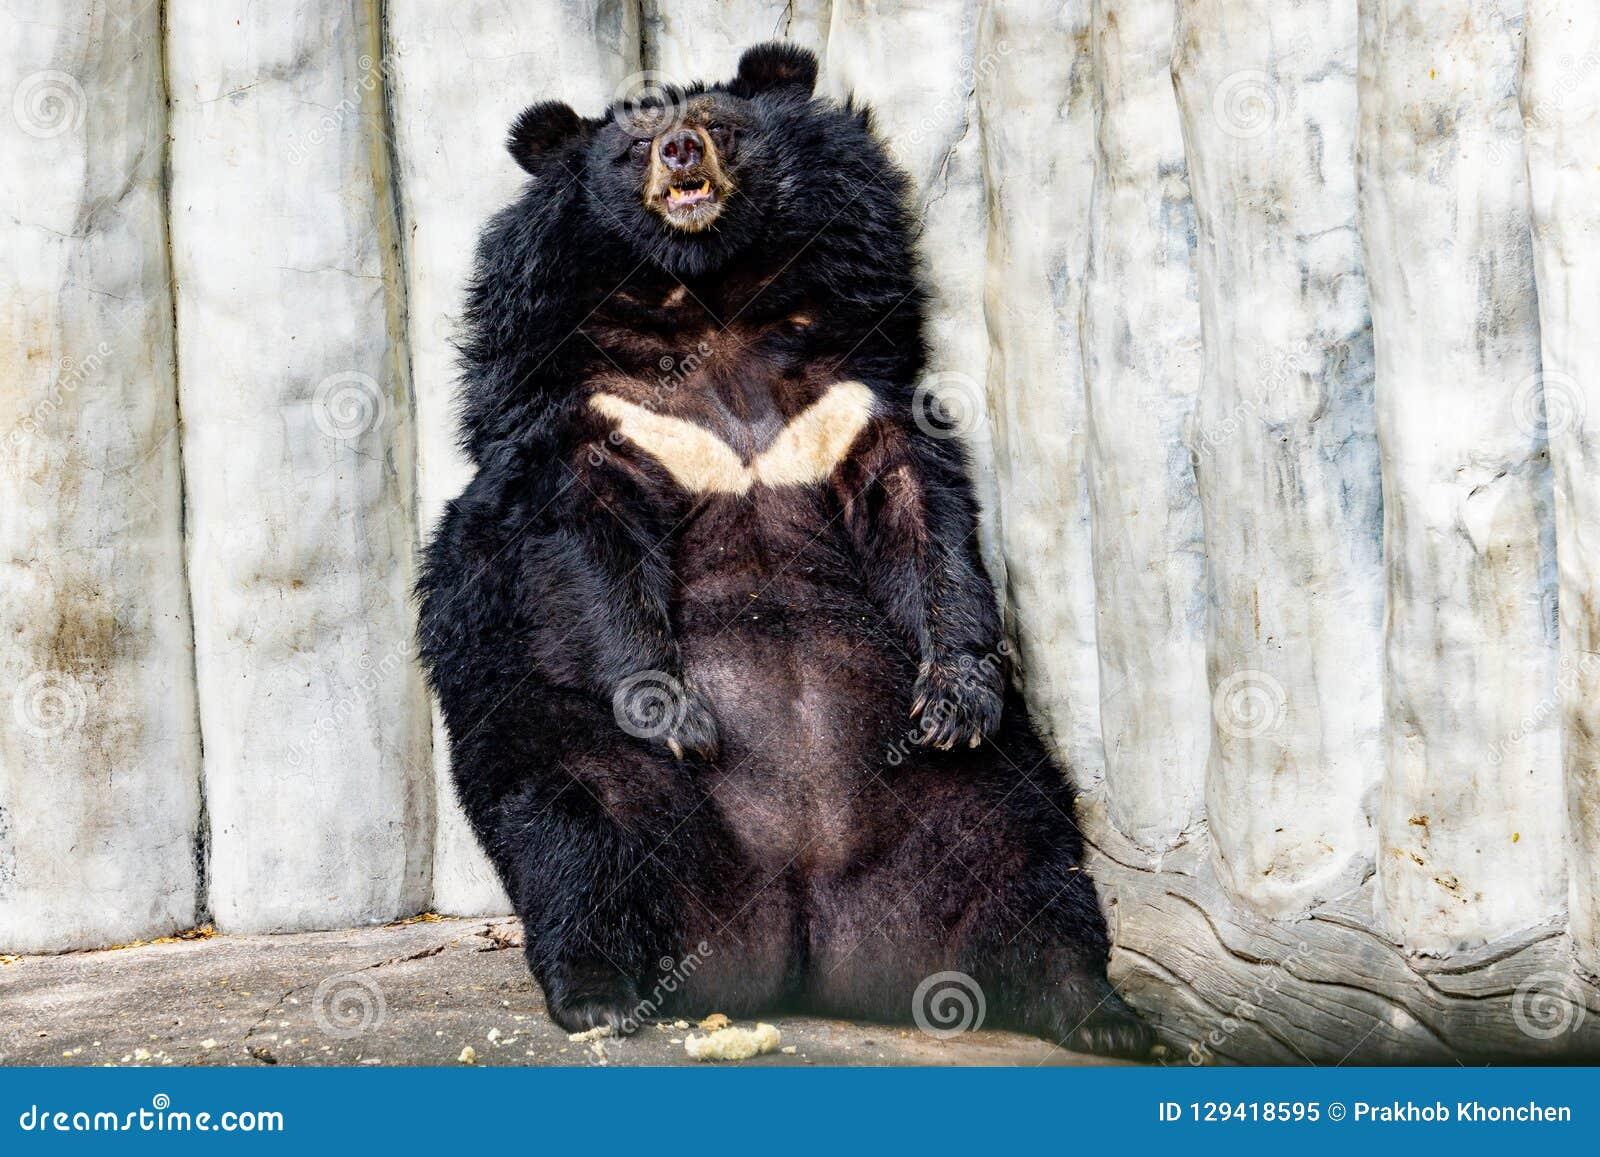 black bear asiatic black bear x28 selenarctos thibetanus x29